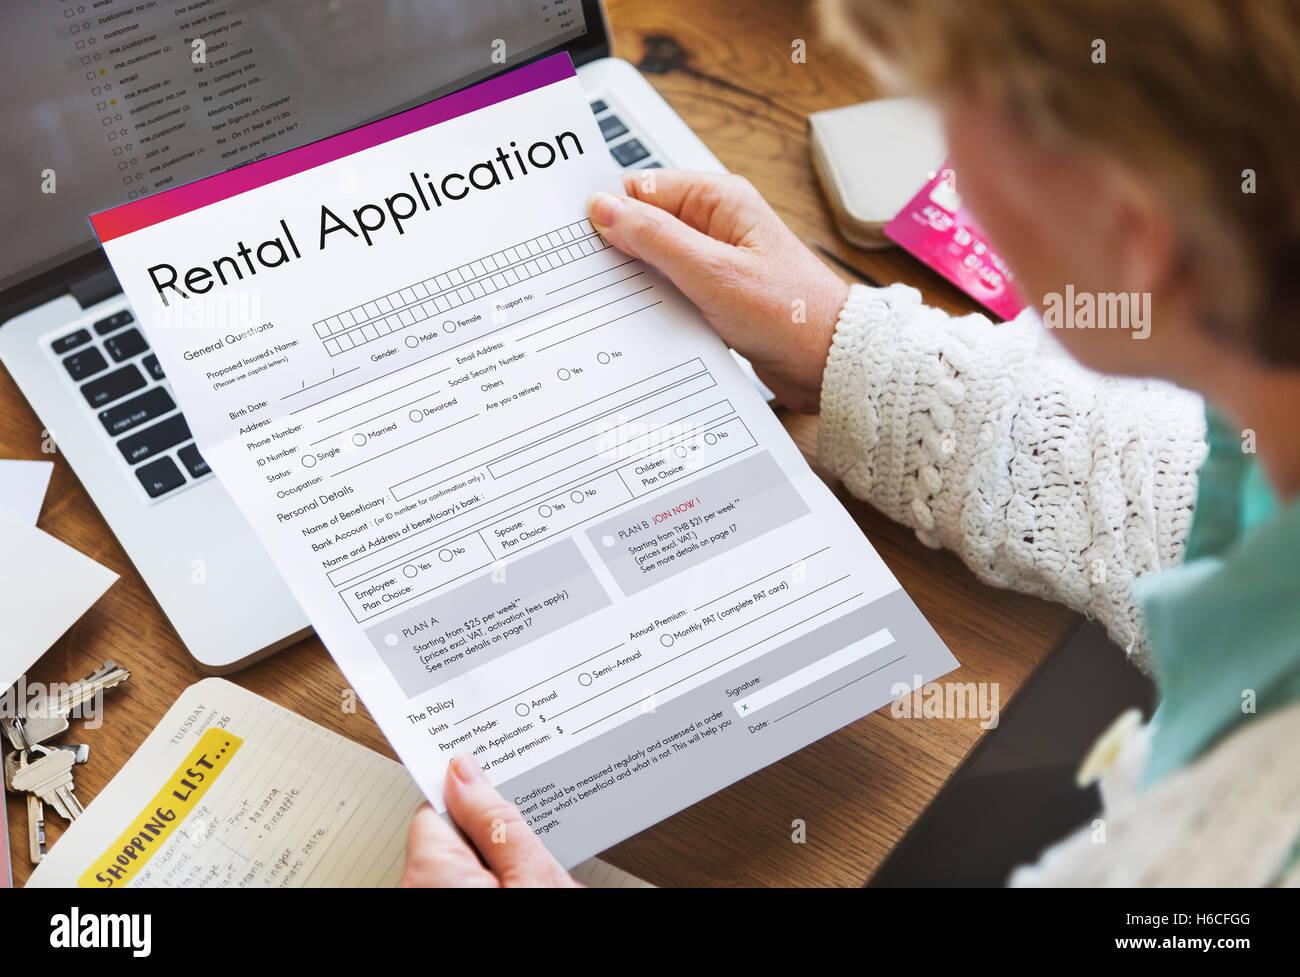 Rental Application Leasable Borrow Apply Rent Concept Stock Photo